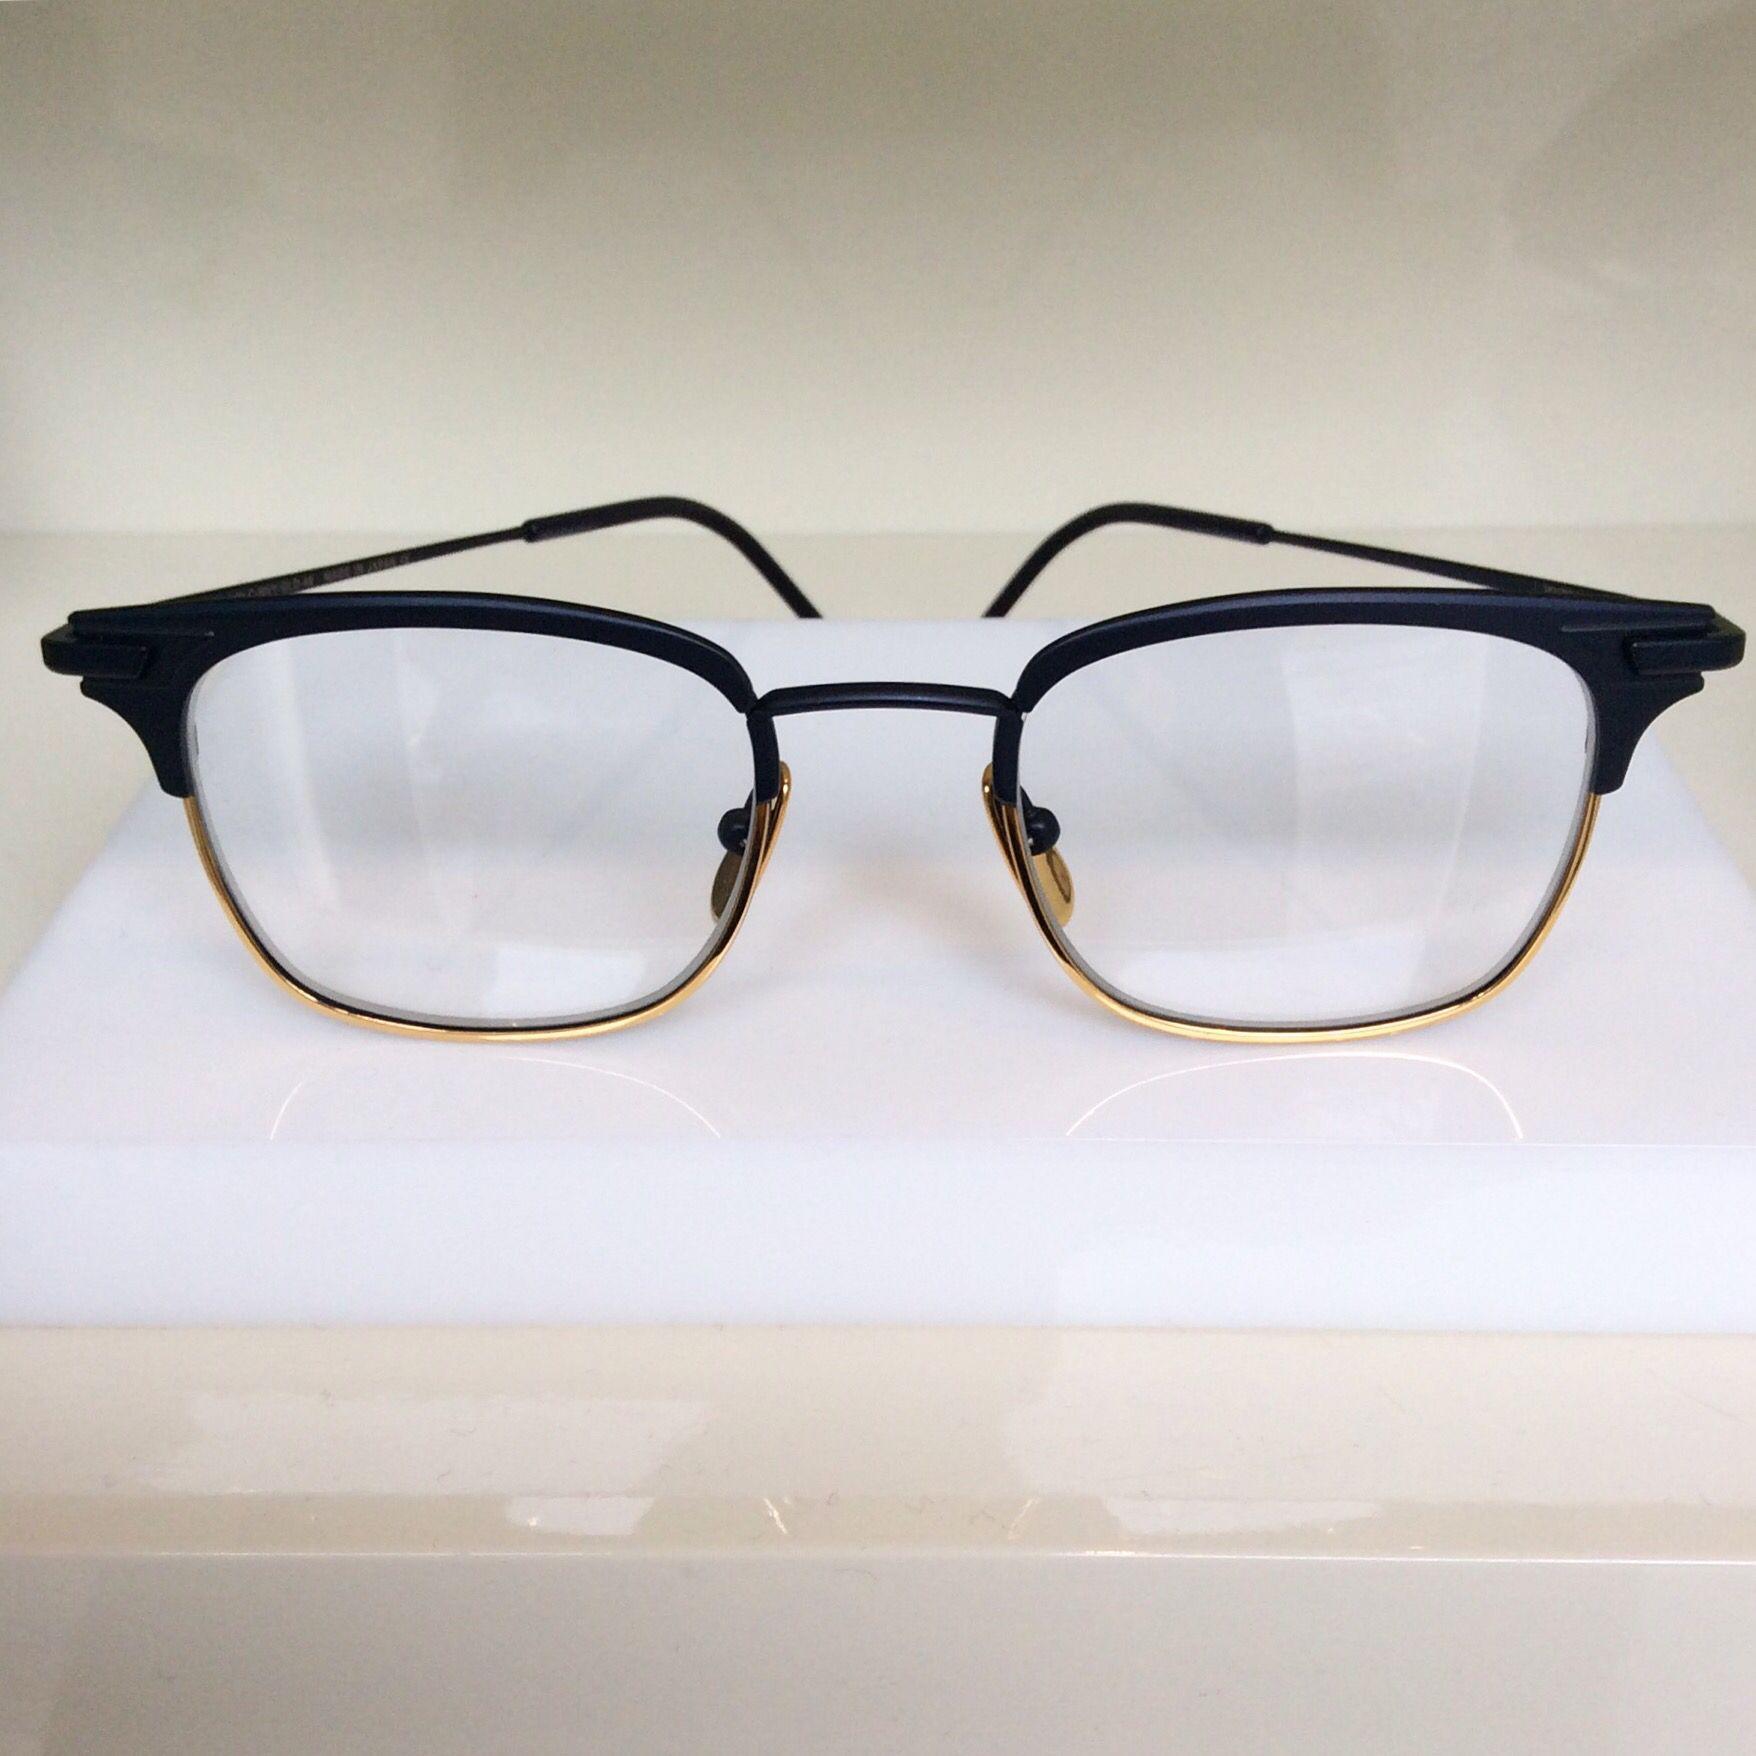 8960820c581b Luxury specs from Thom Browne Eyewear